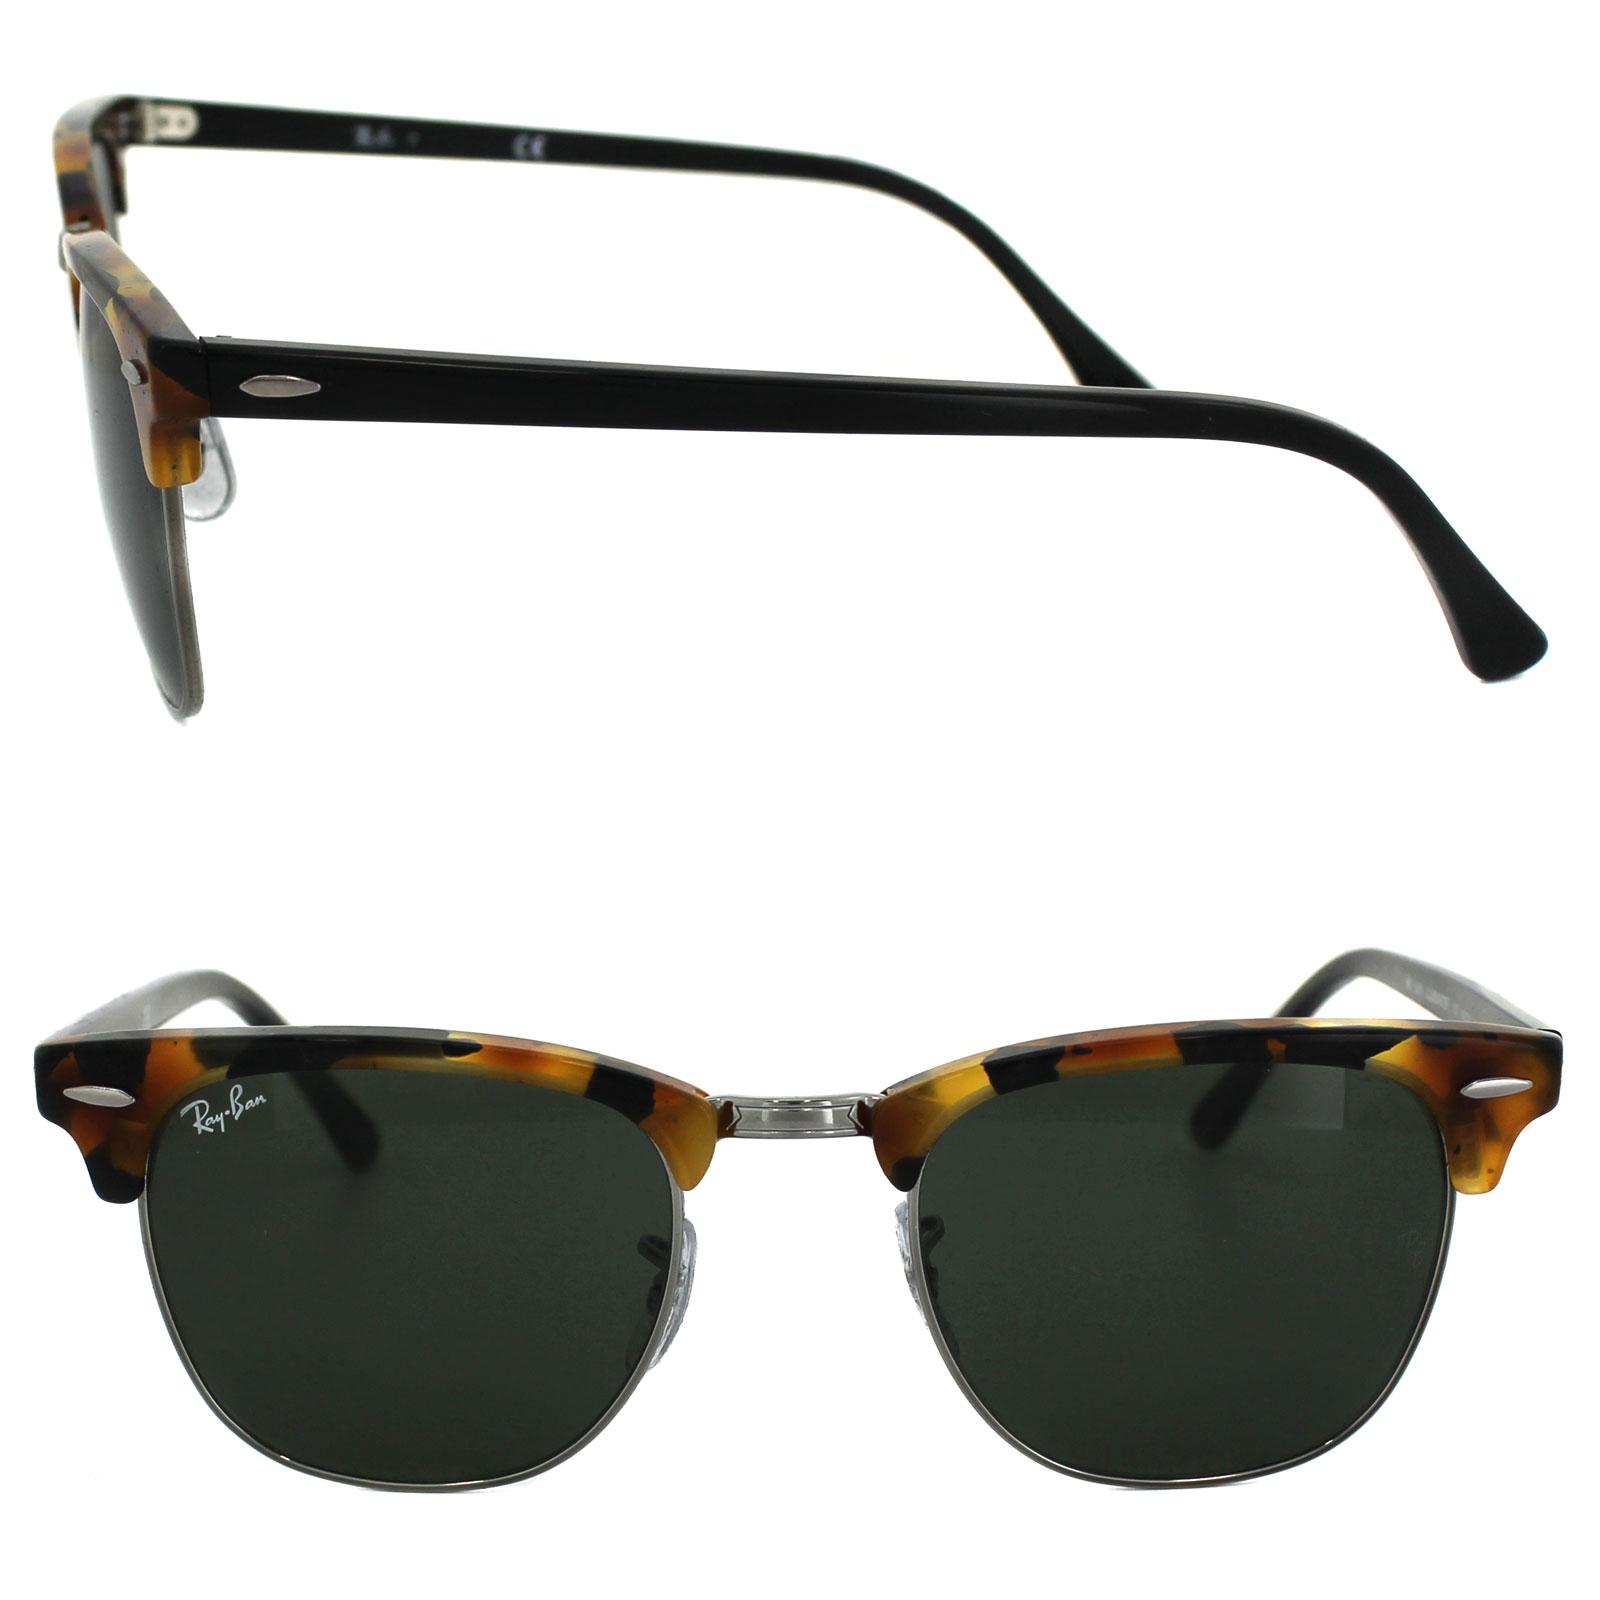 d4487f1298e Sentinel Ray-Ban Sunglasses Clubmaster 3016 1157 Fleck Tortoise   Black  Green